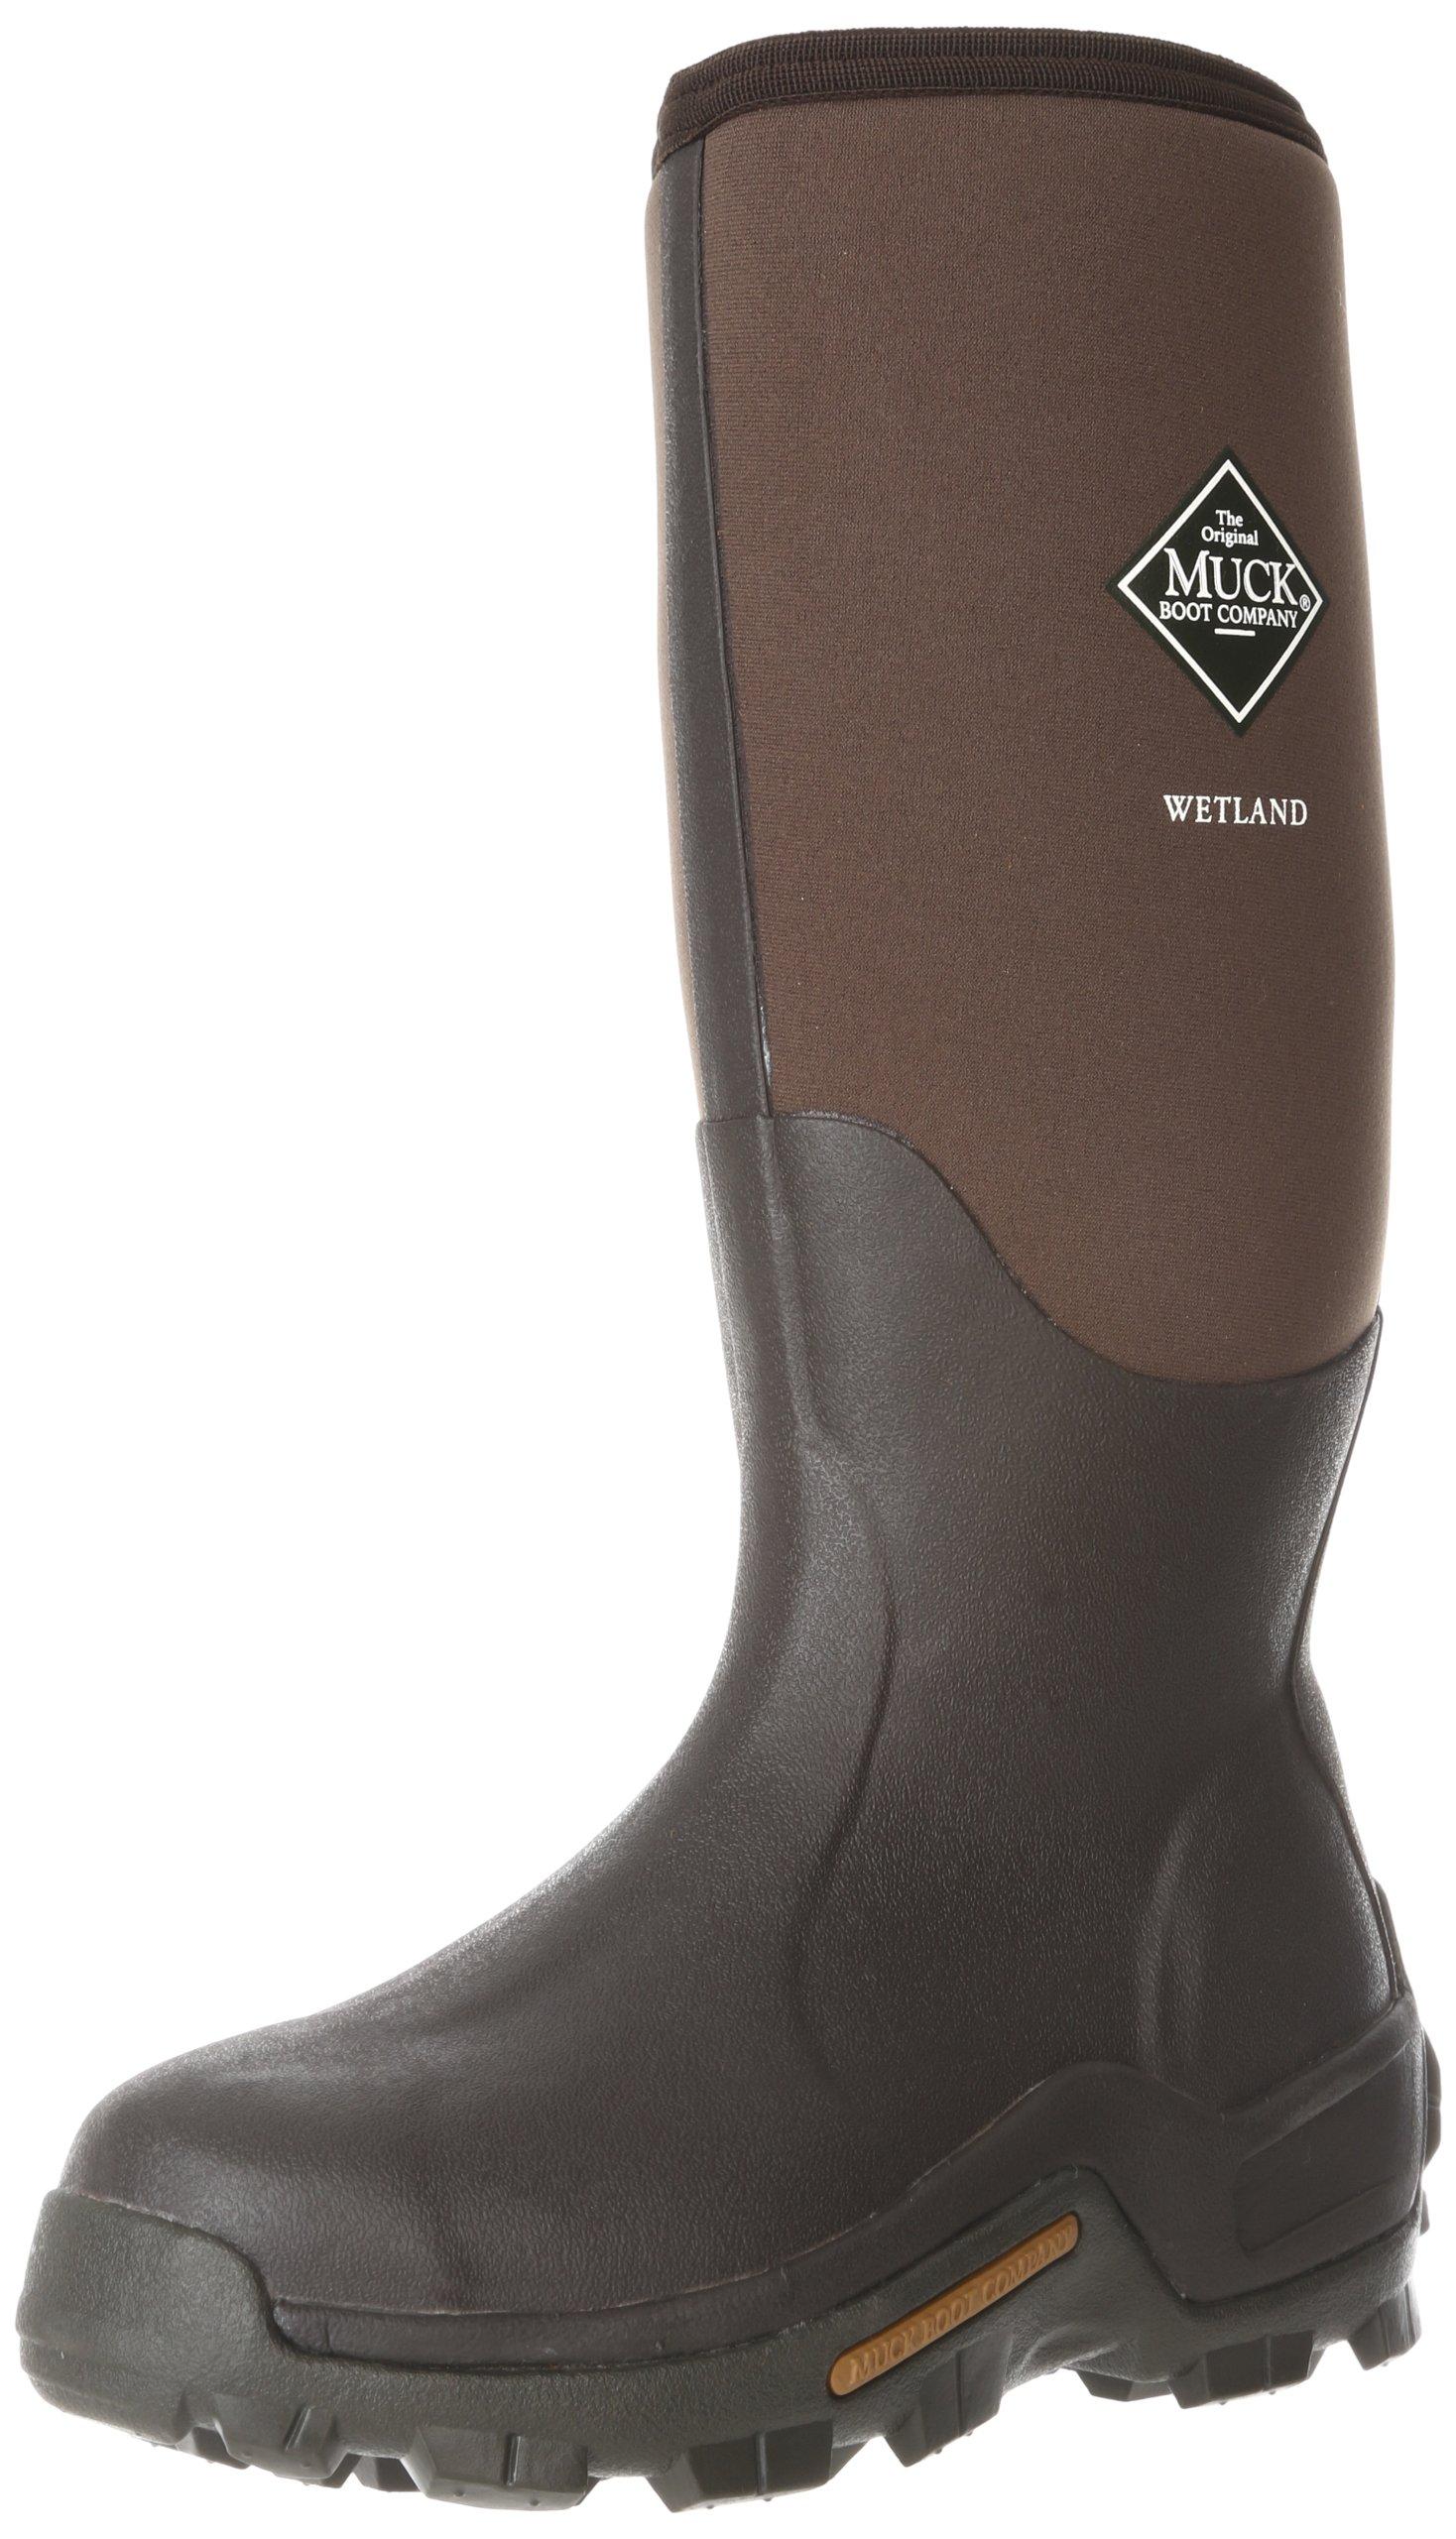 Muck Wetland Rubber Premium Men's Field Boots,Bark,Men's 14 M/Women's 15 M by MuckBoots